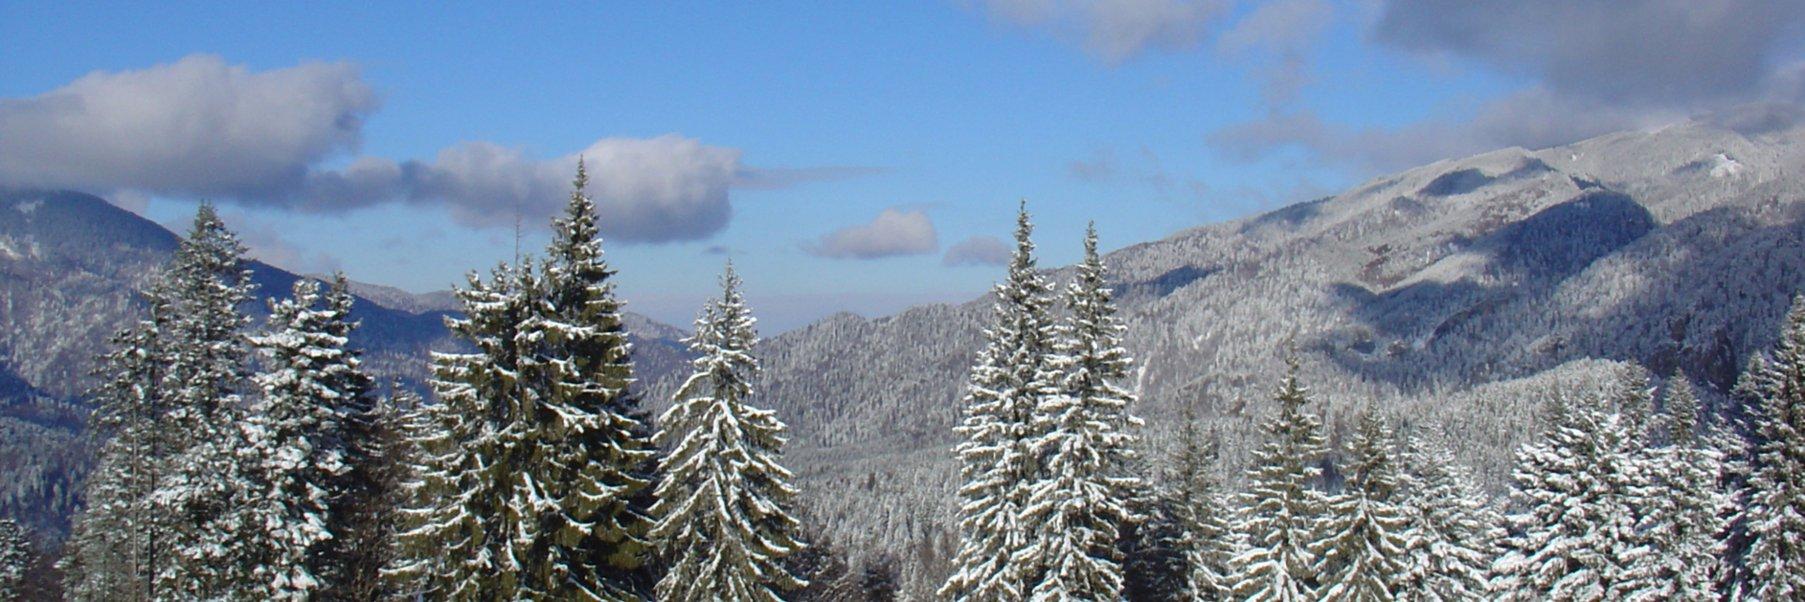 white_mountains_winter_riverwalk.jpg